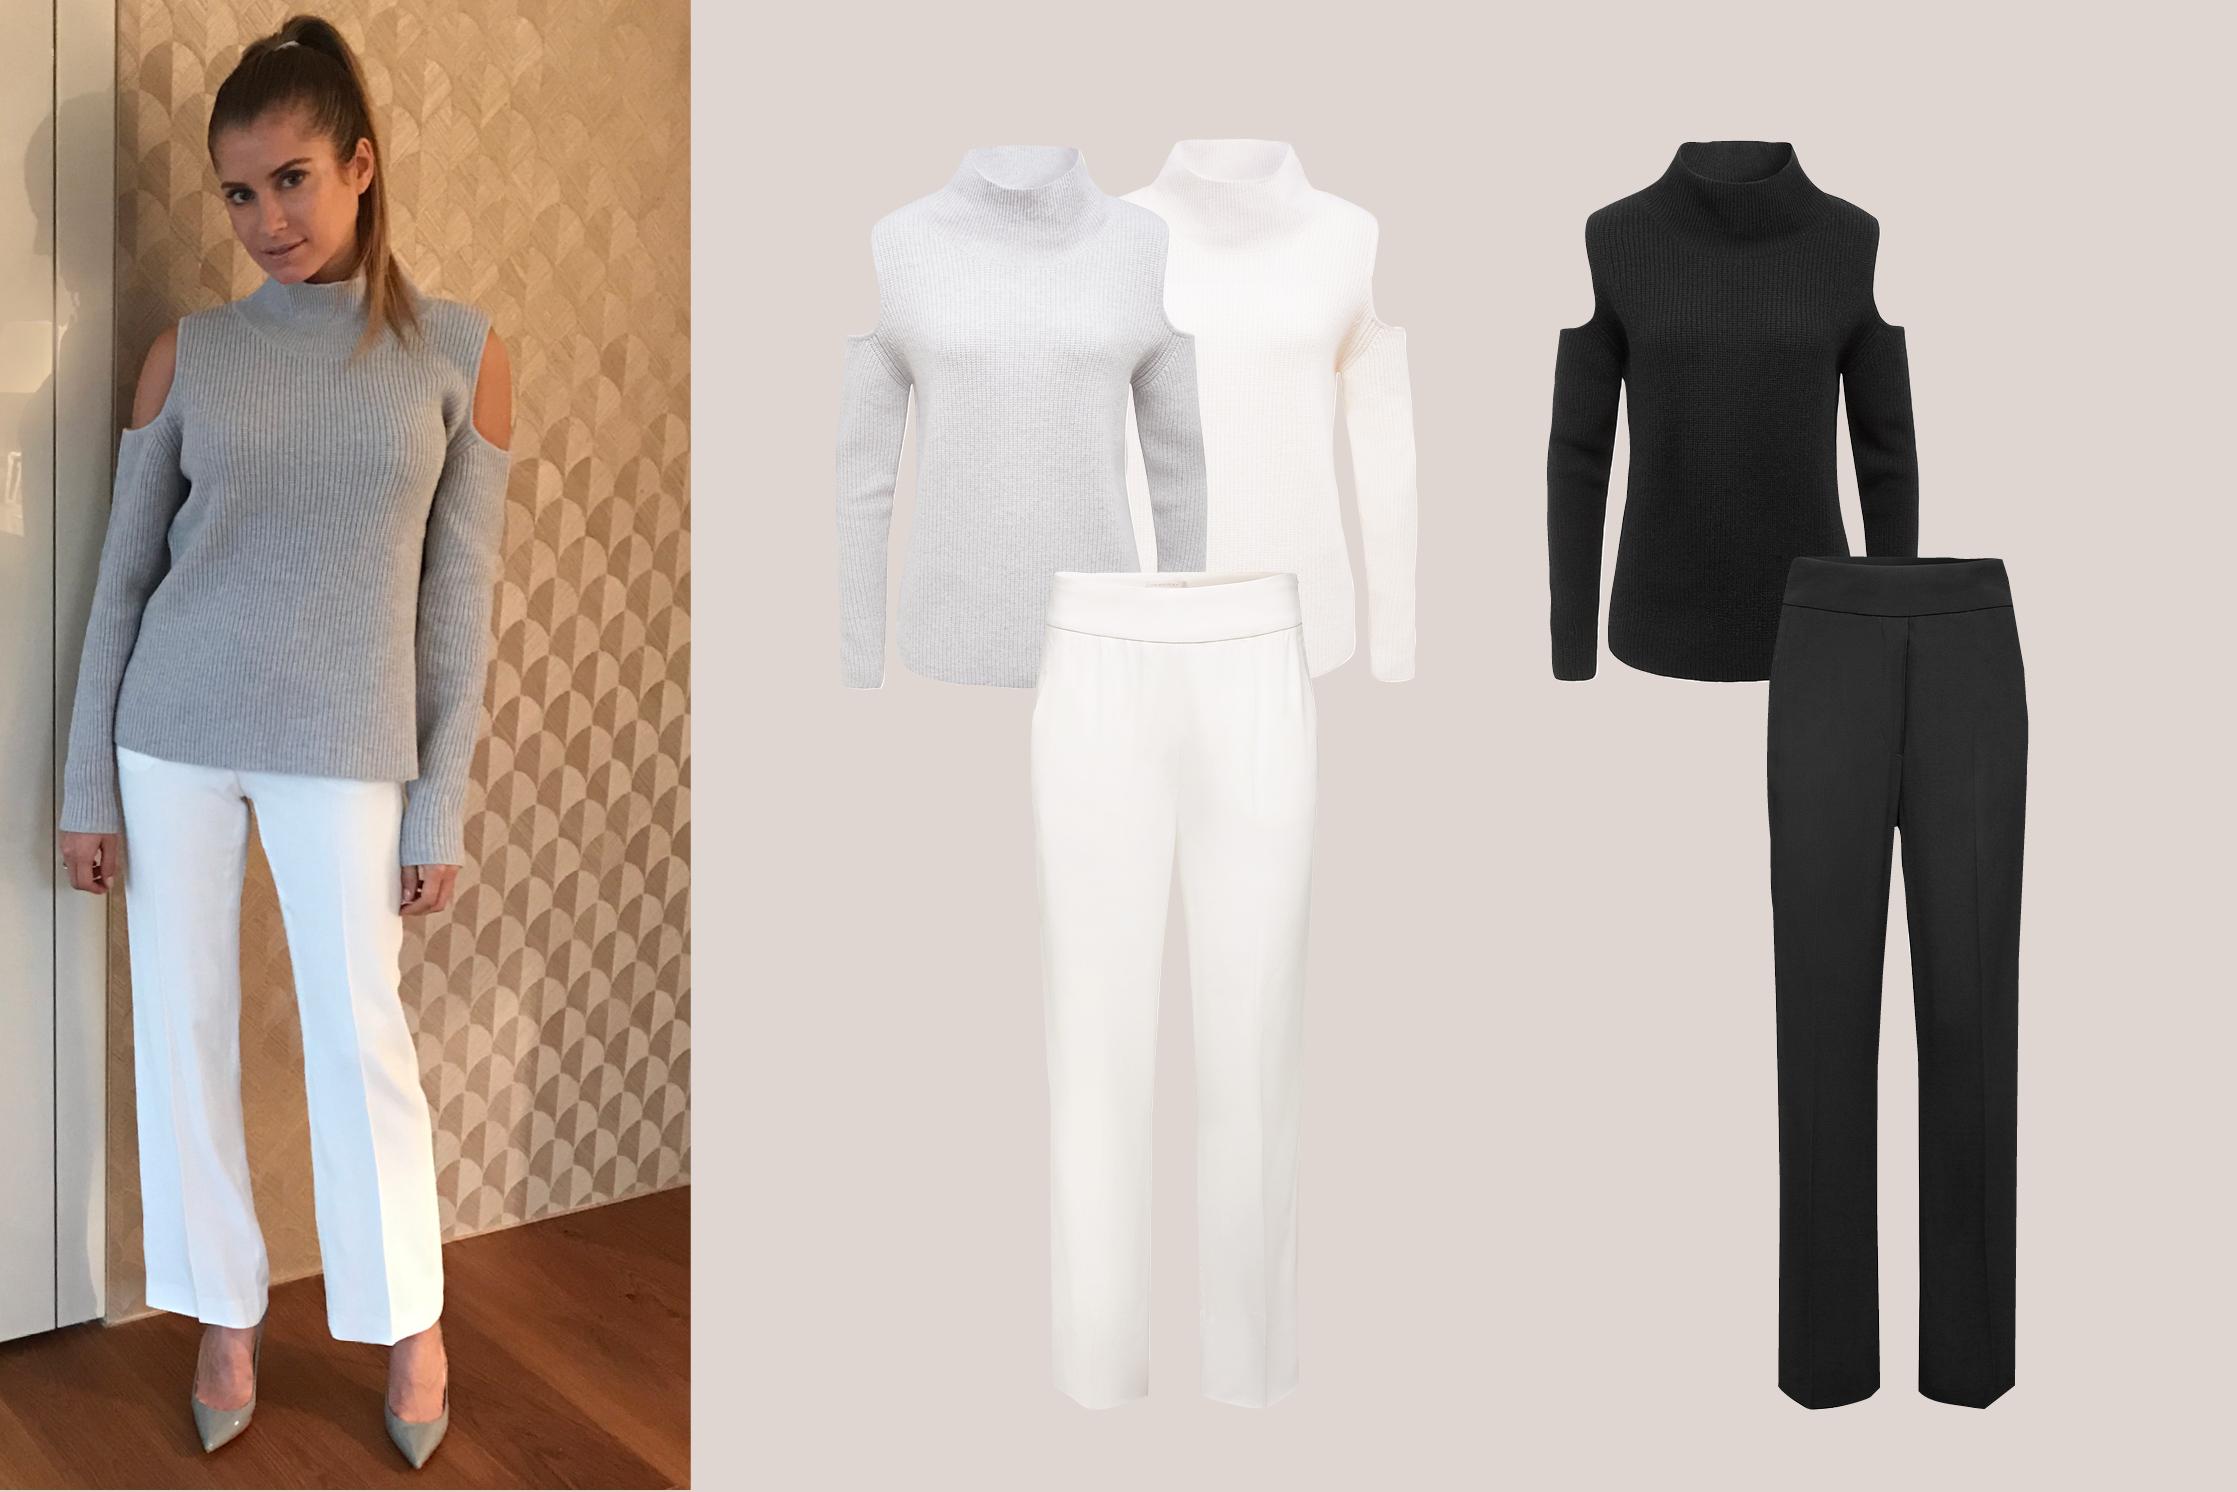 Cold-Shoulder im Rippenstrick - Fashion Must-Have für den Frühling